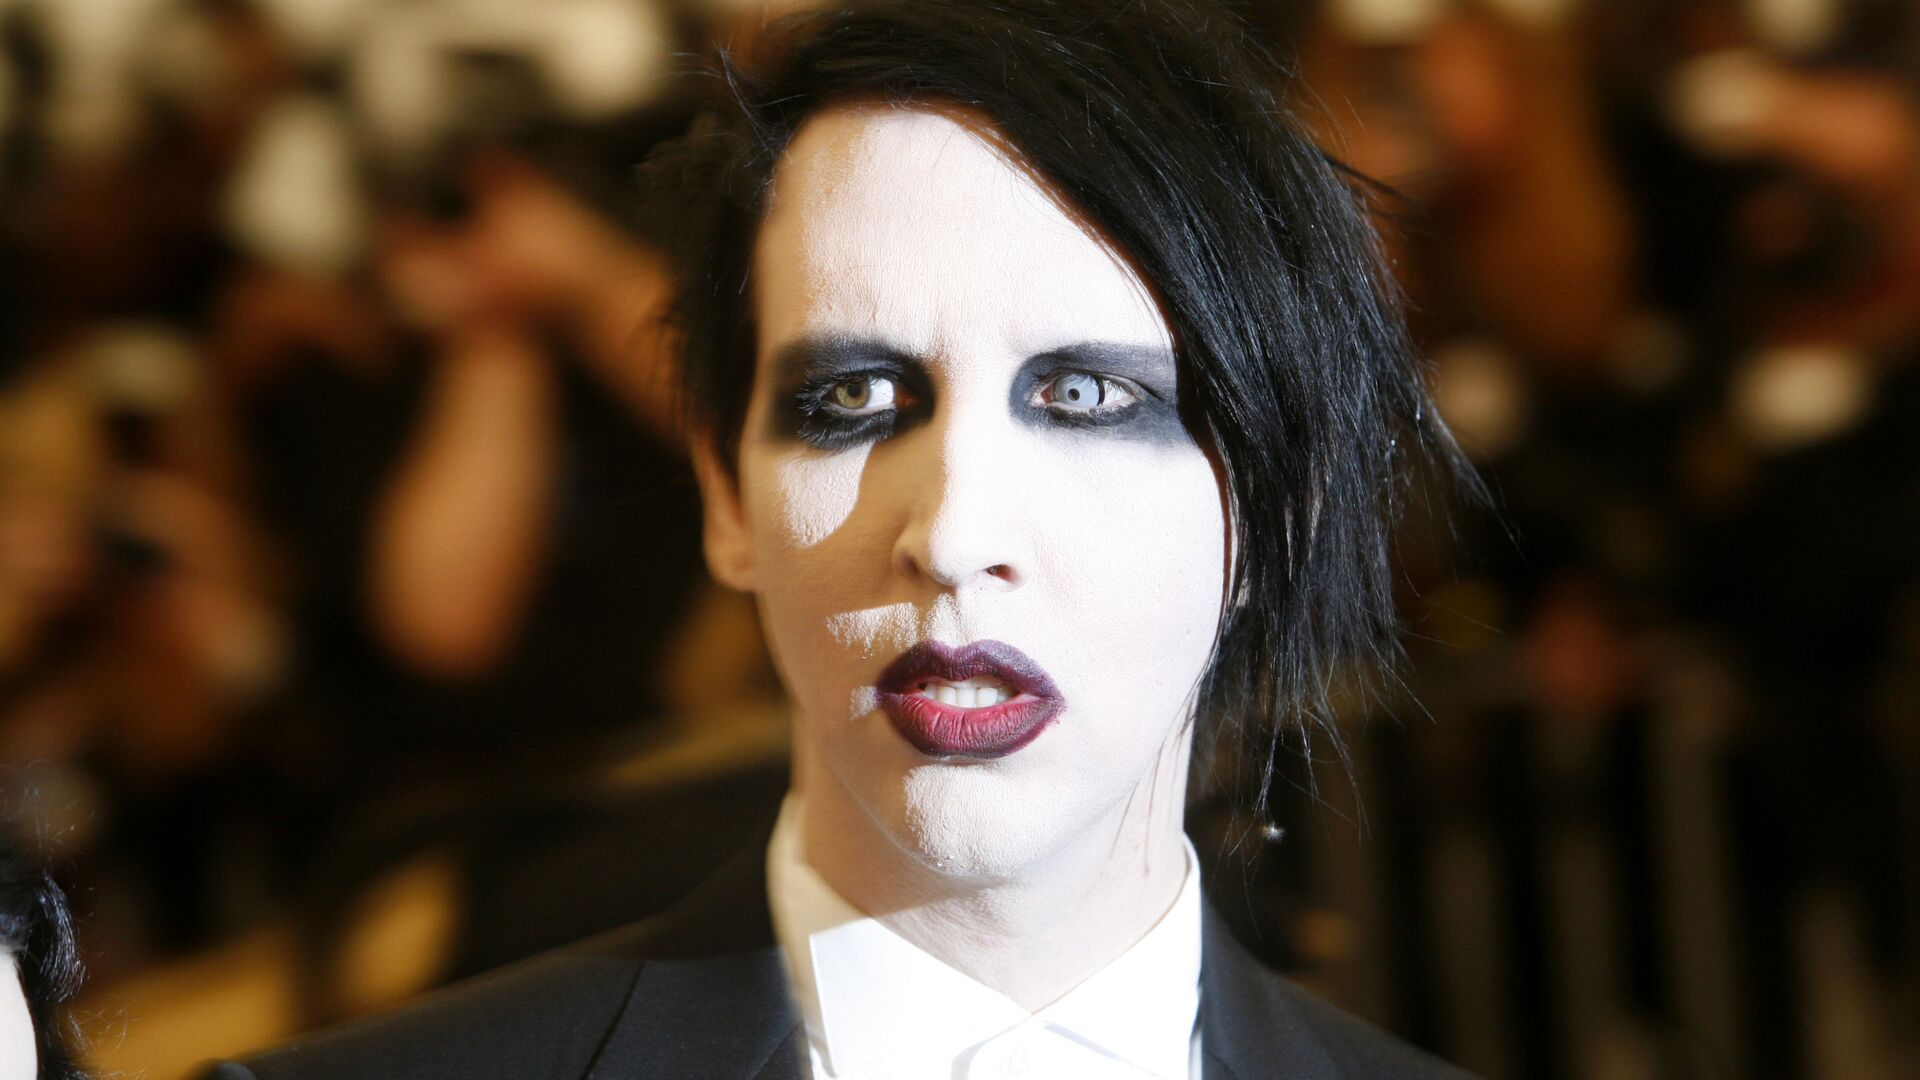 Rokový muzikant Marilyn Manson  - Sputnik Česká republika, 1920, 01.05.2021